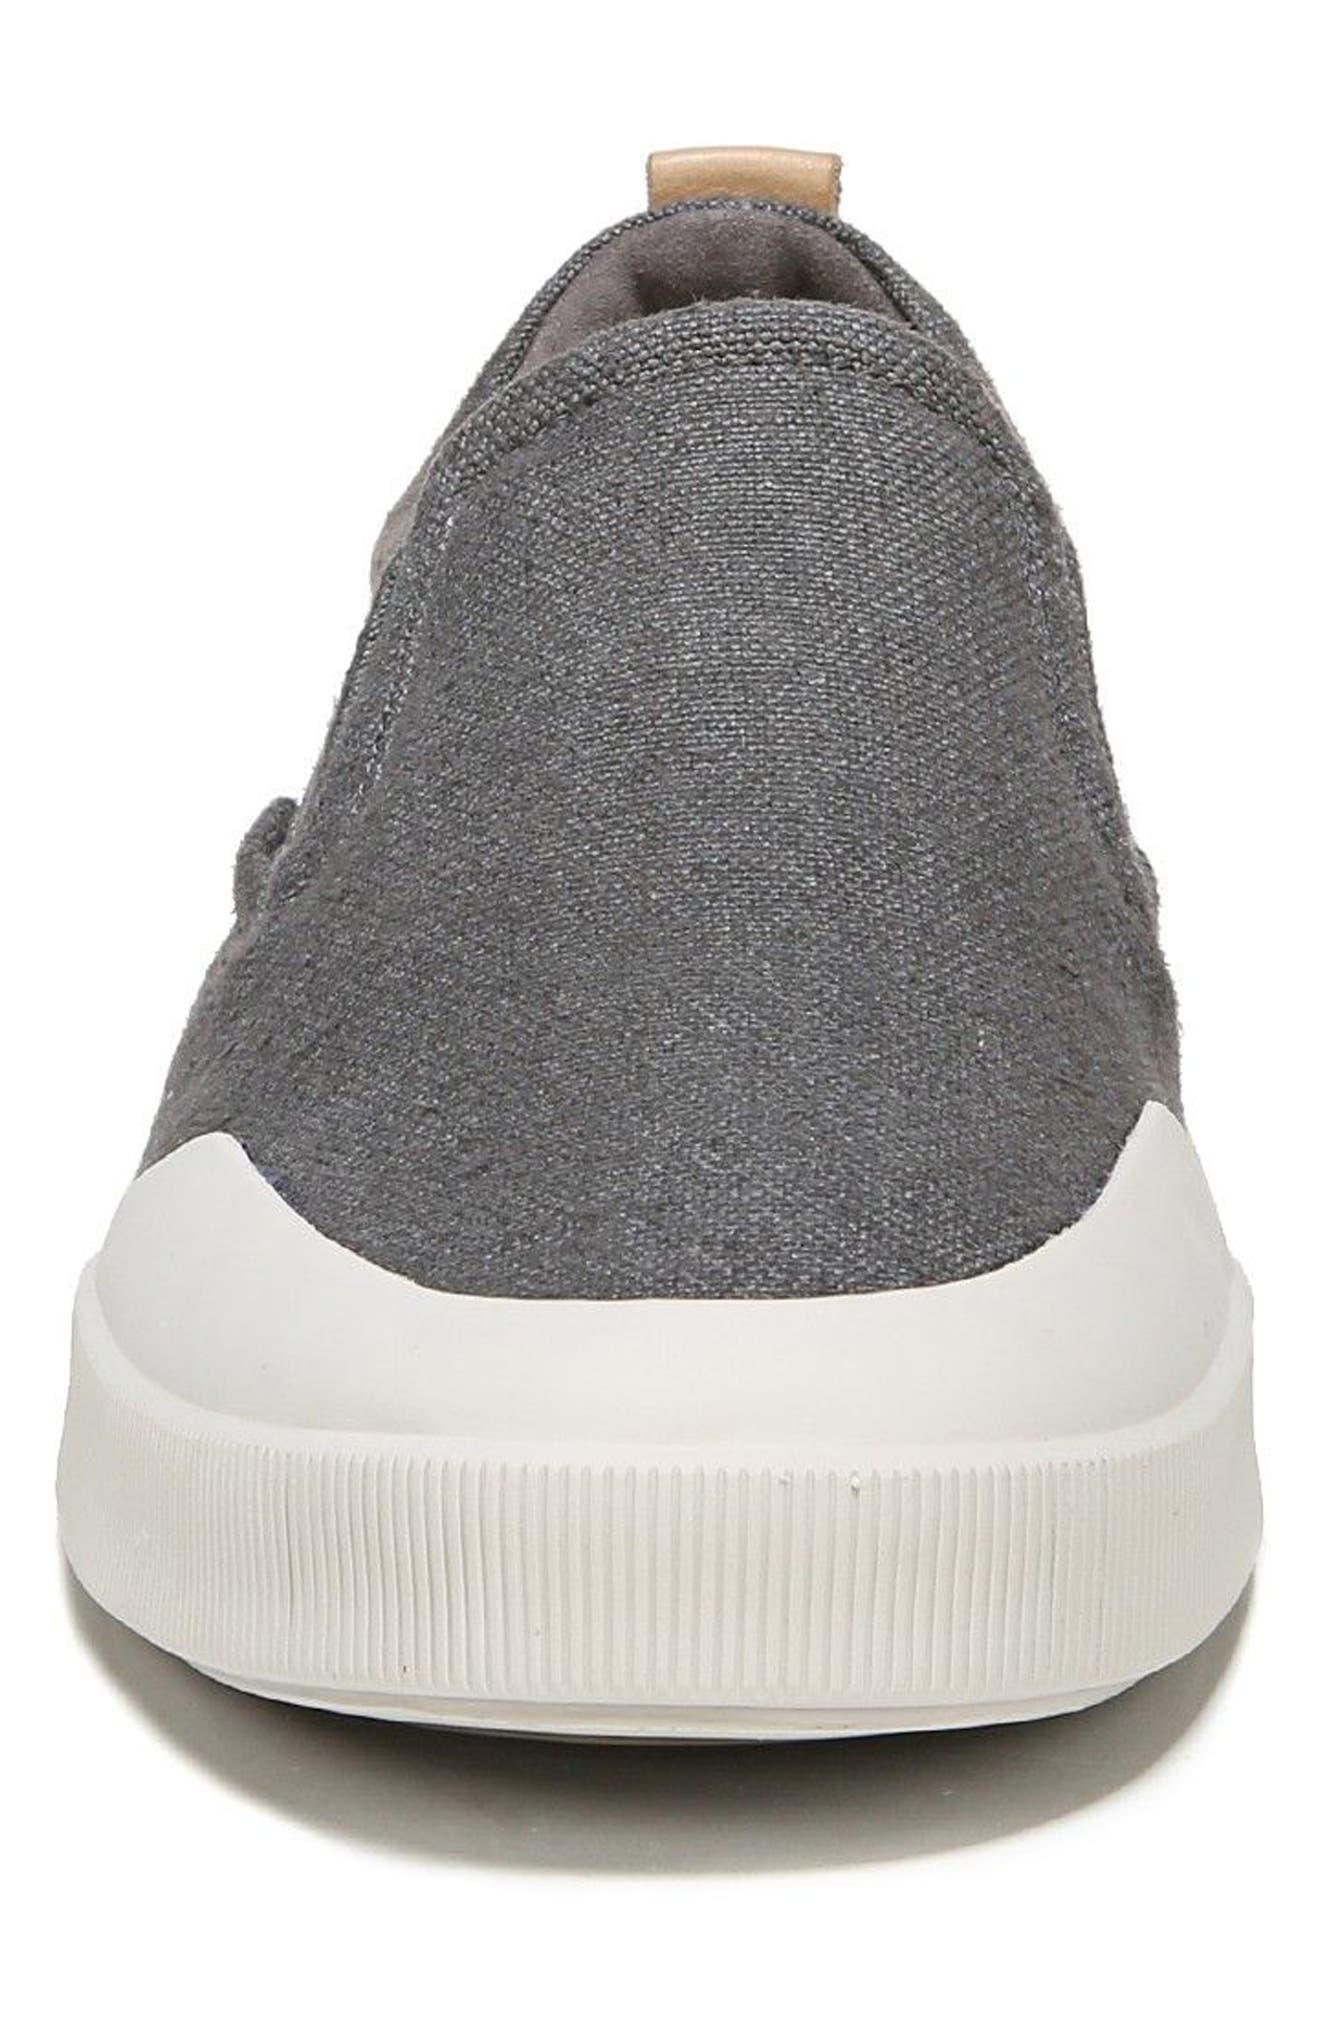 Vernon Slip-On Sneaker,                             Alternate thumbnail 4, color,                             Graphite/ Cuoio